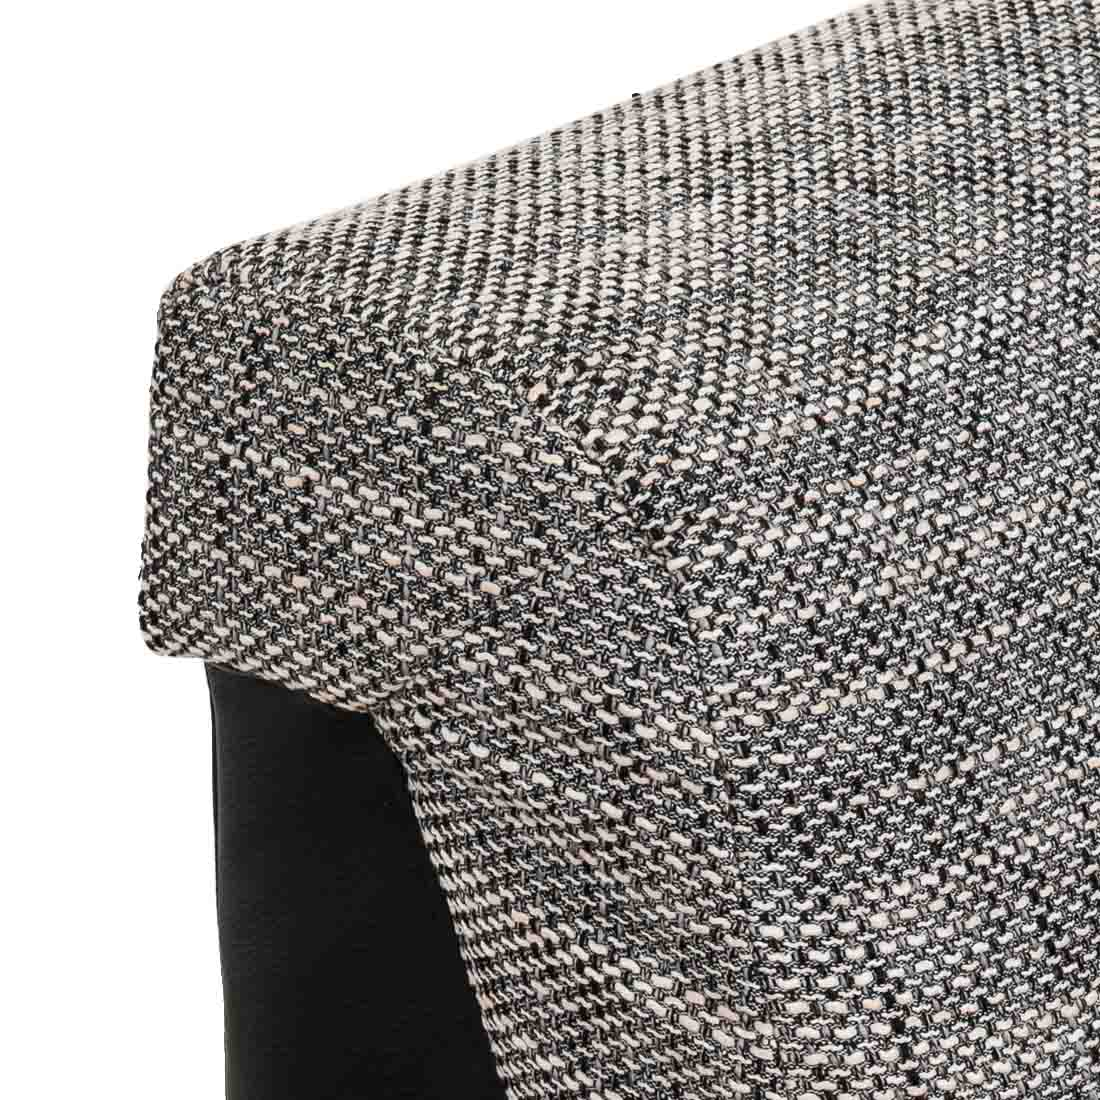 ecksofa stoff schwarz grau ottomane links eckcouch sofa couch couchgarnitur neu ebay. Black Bedroom Furniture Sets. Home Design Ideas